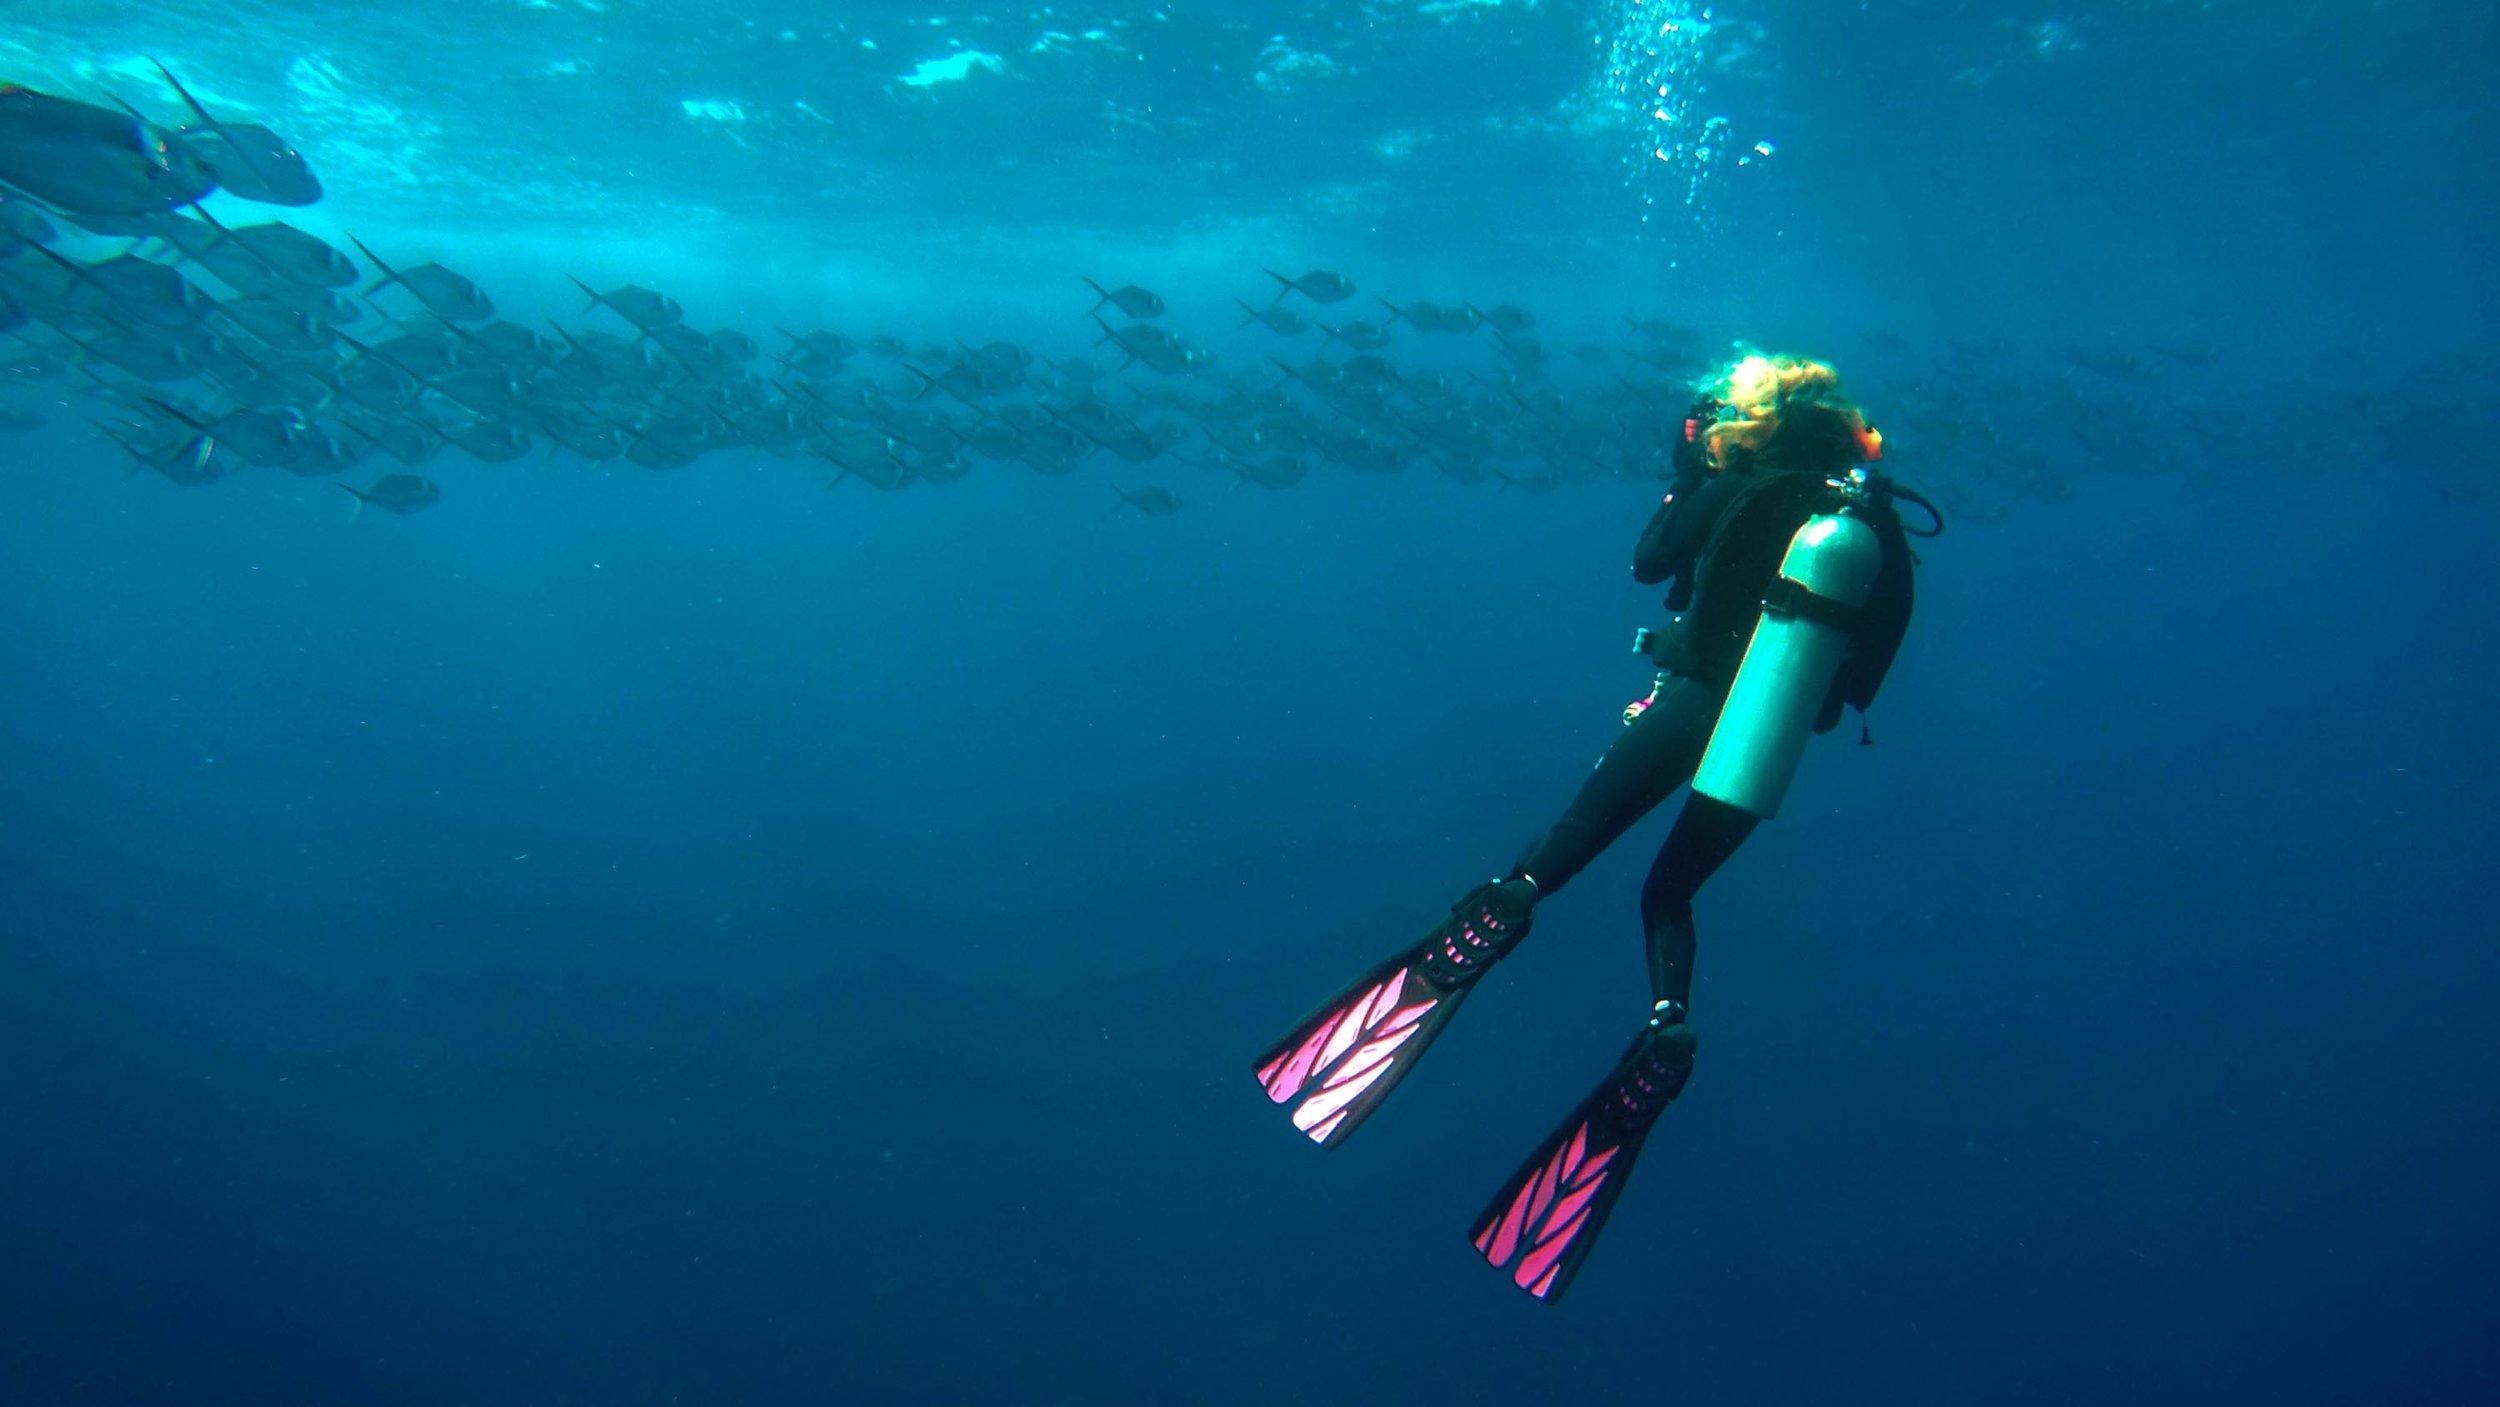 Scuba dive in the Galapagos. (Photo courtesy Tiffany Duong)